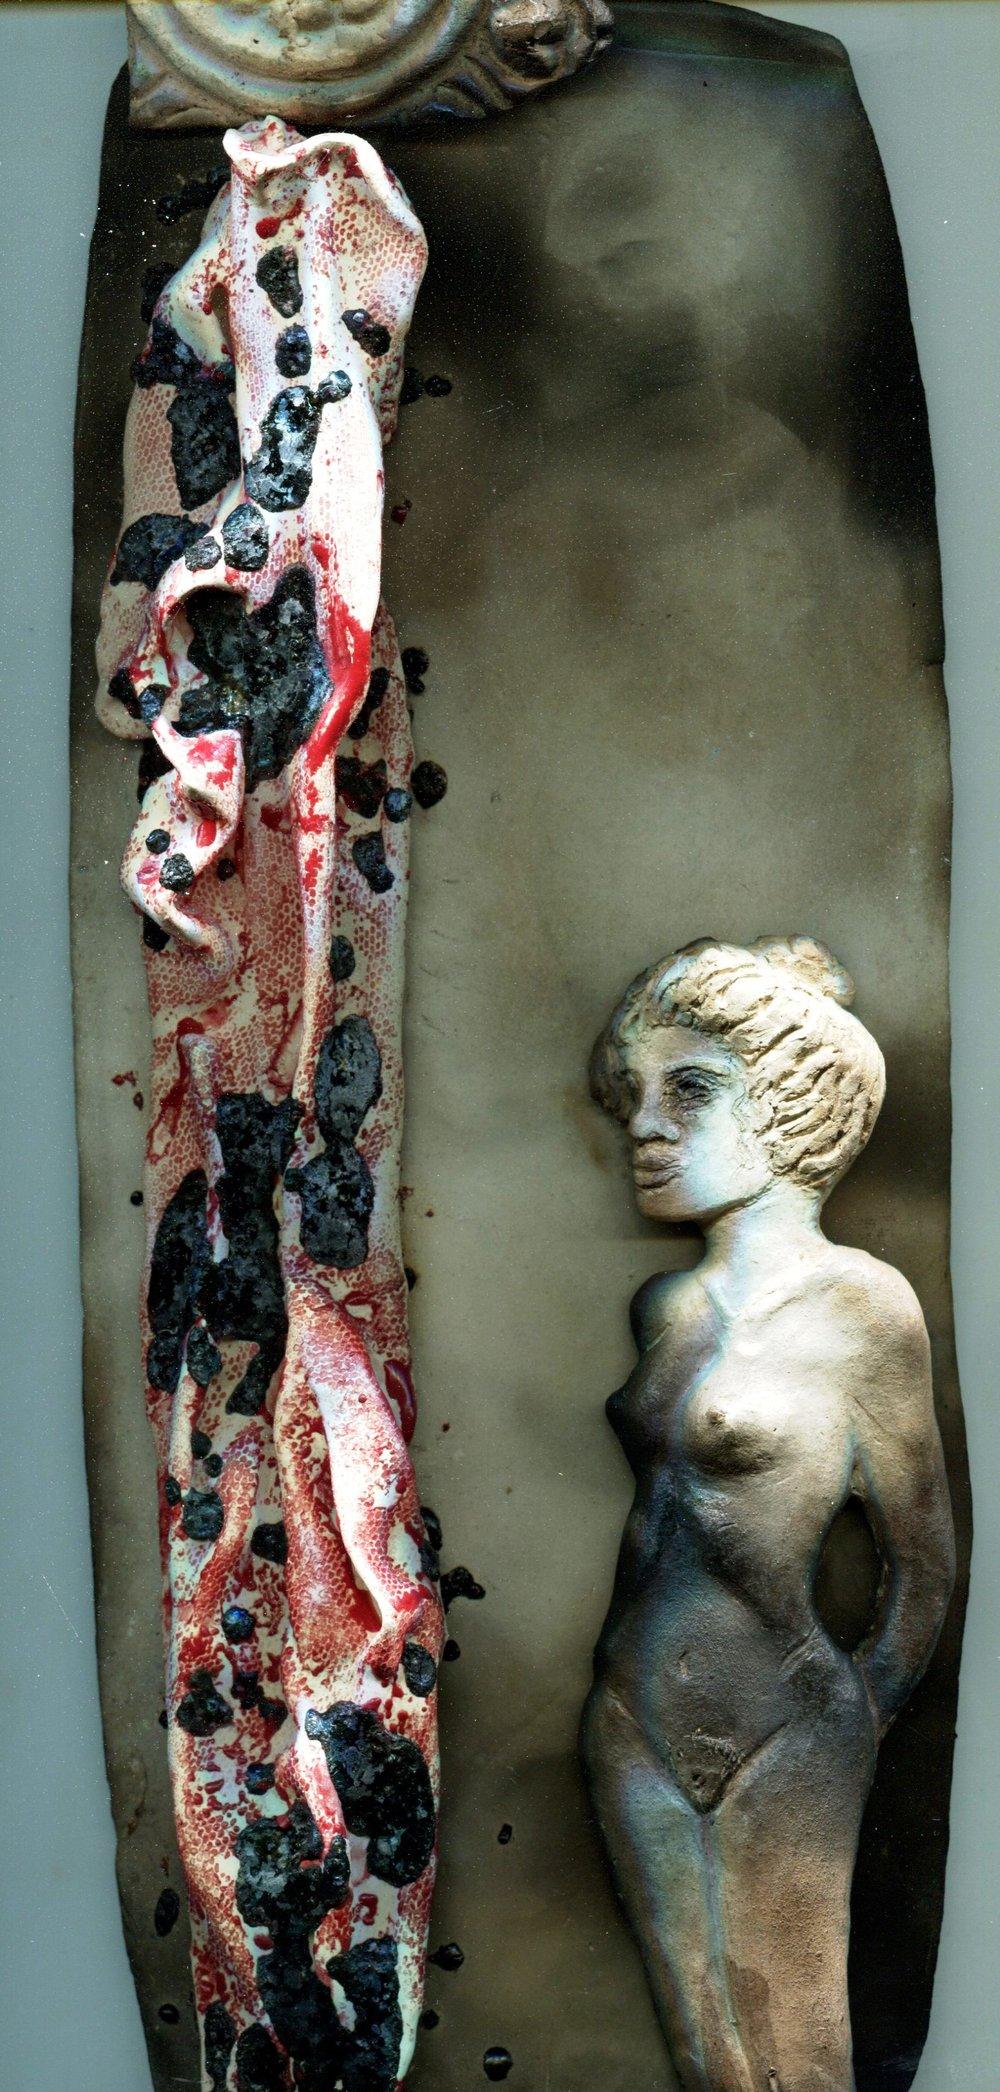 67c Willemien Cilliers, Portrait 3, Ceramic & glass